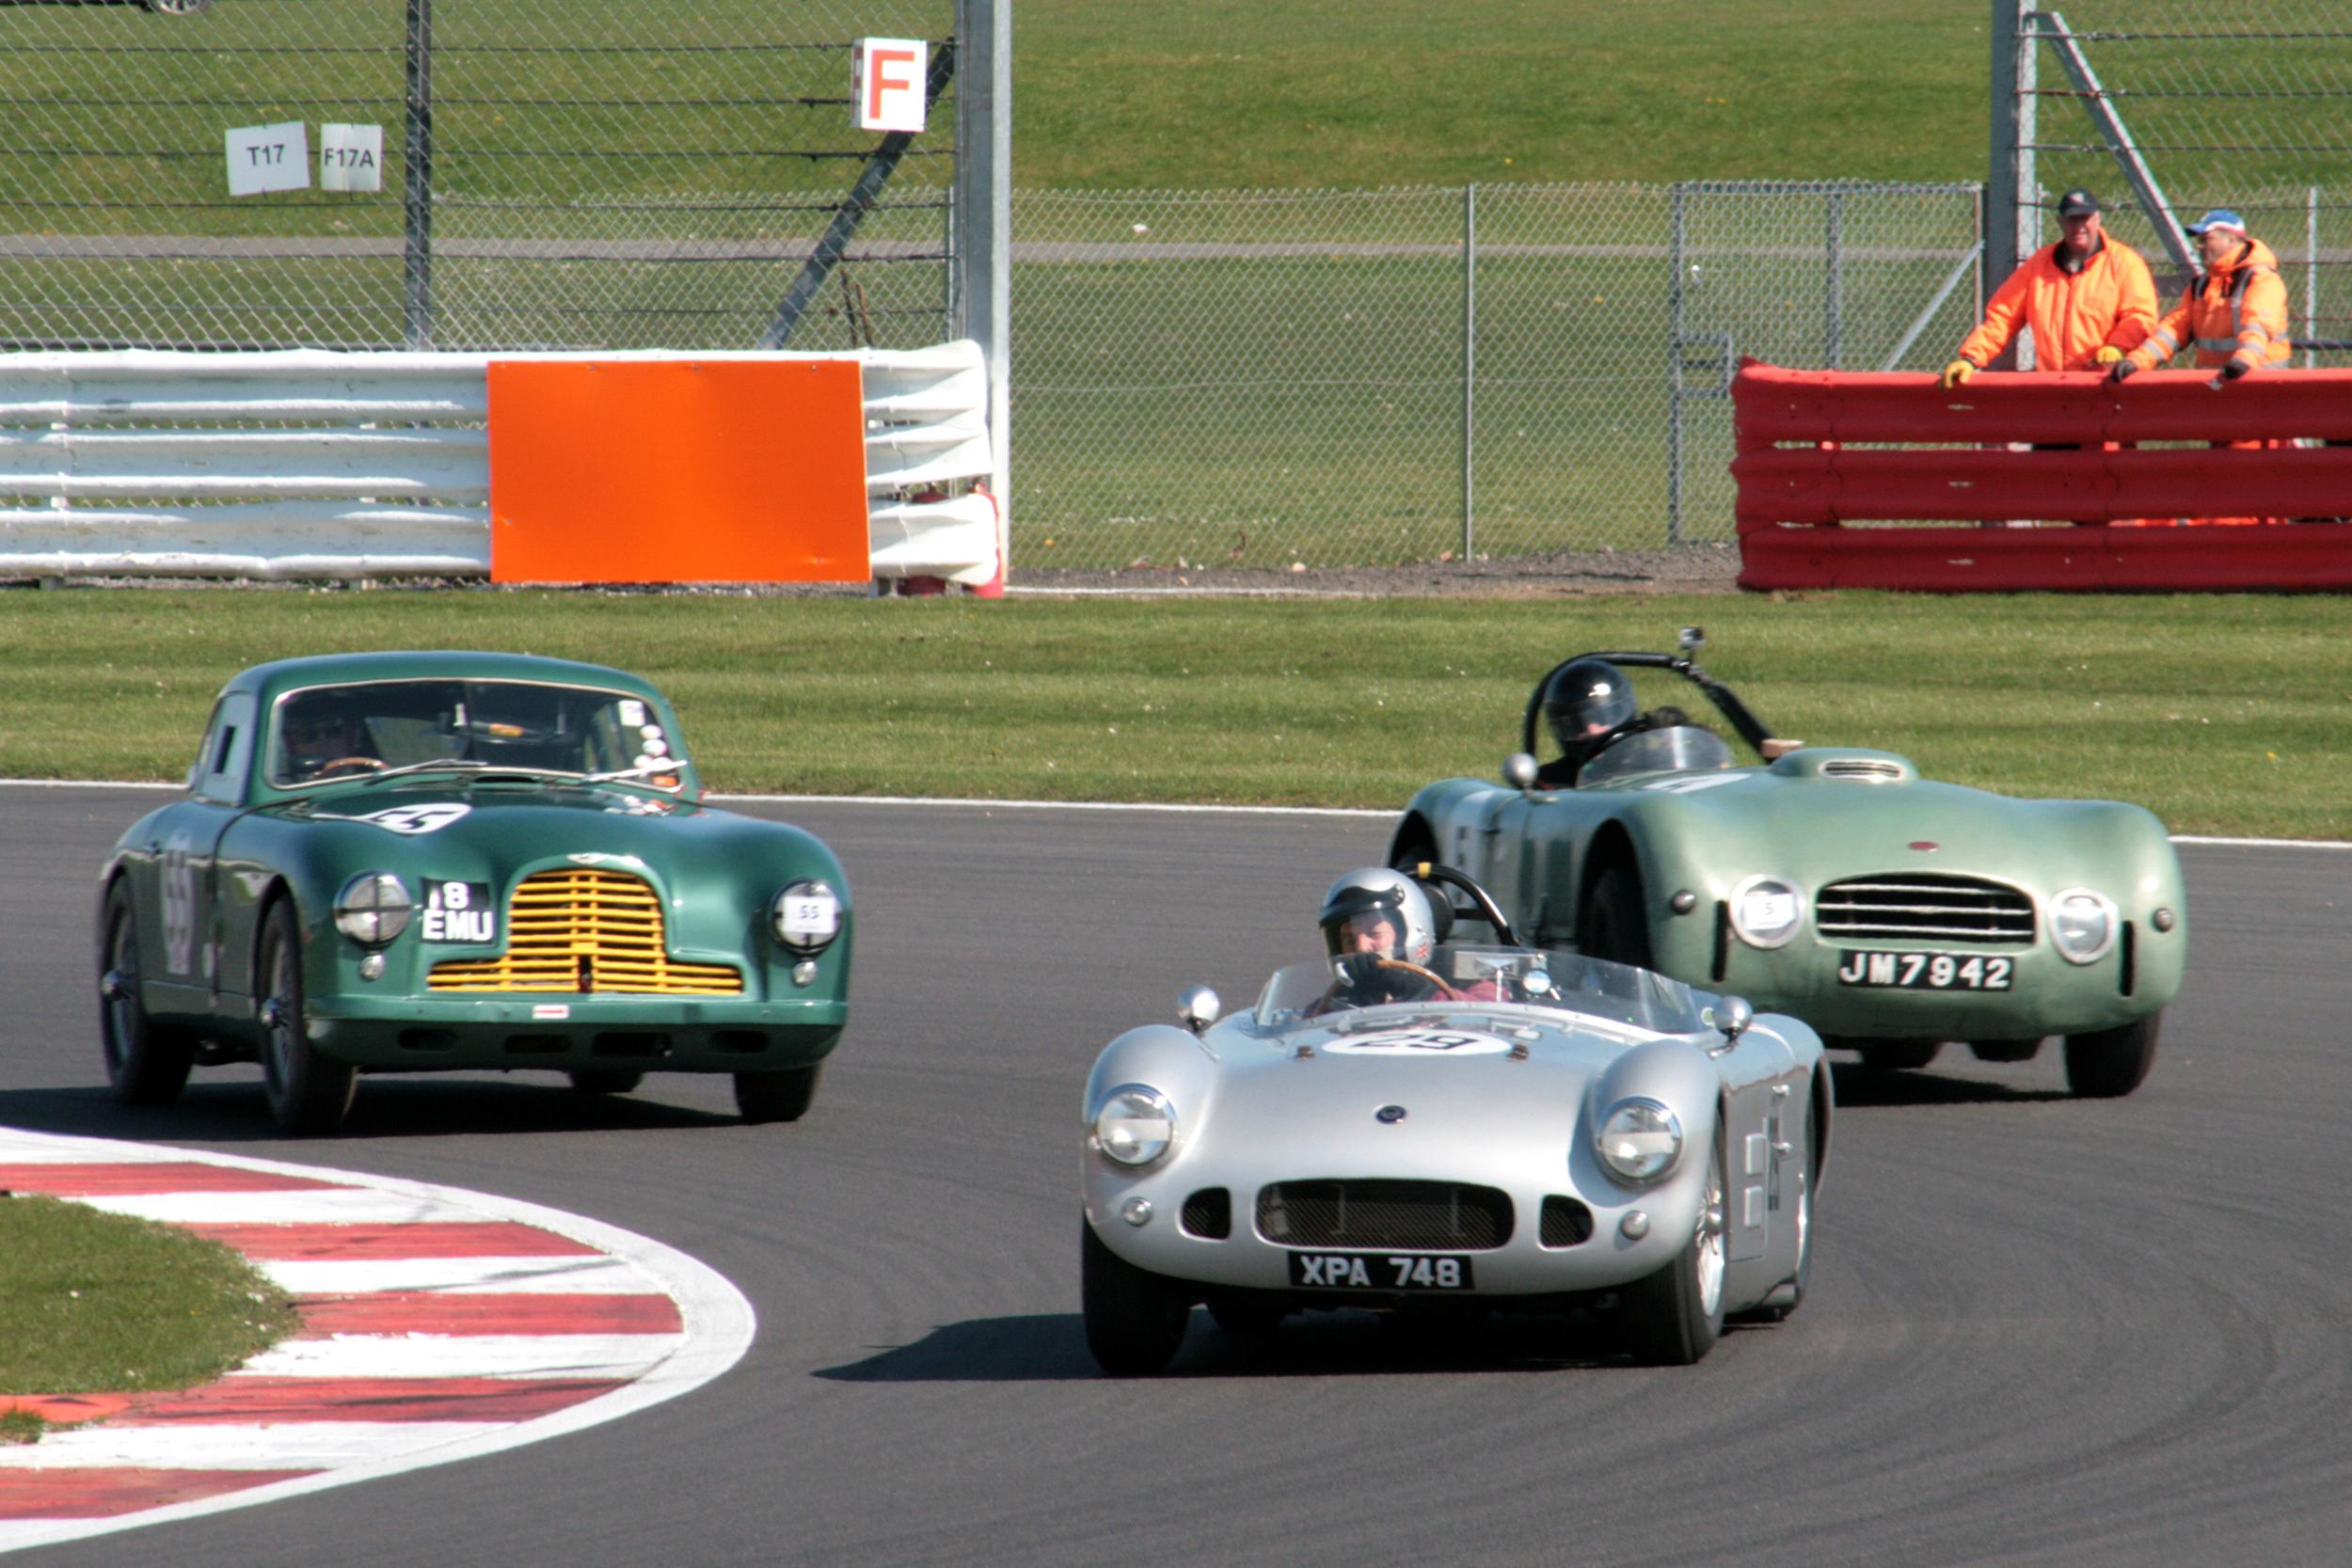 Great British Sports cars battle for 2nd - HWM (Spike Milligan), Aston DB2 (Andrew Sharp)) & Allard J2X Le mans (Tom Walker)  Photo - John Turner